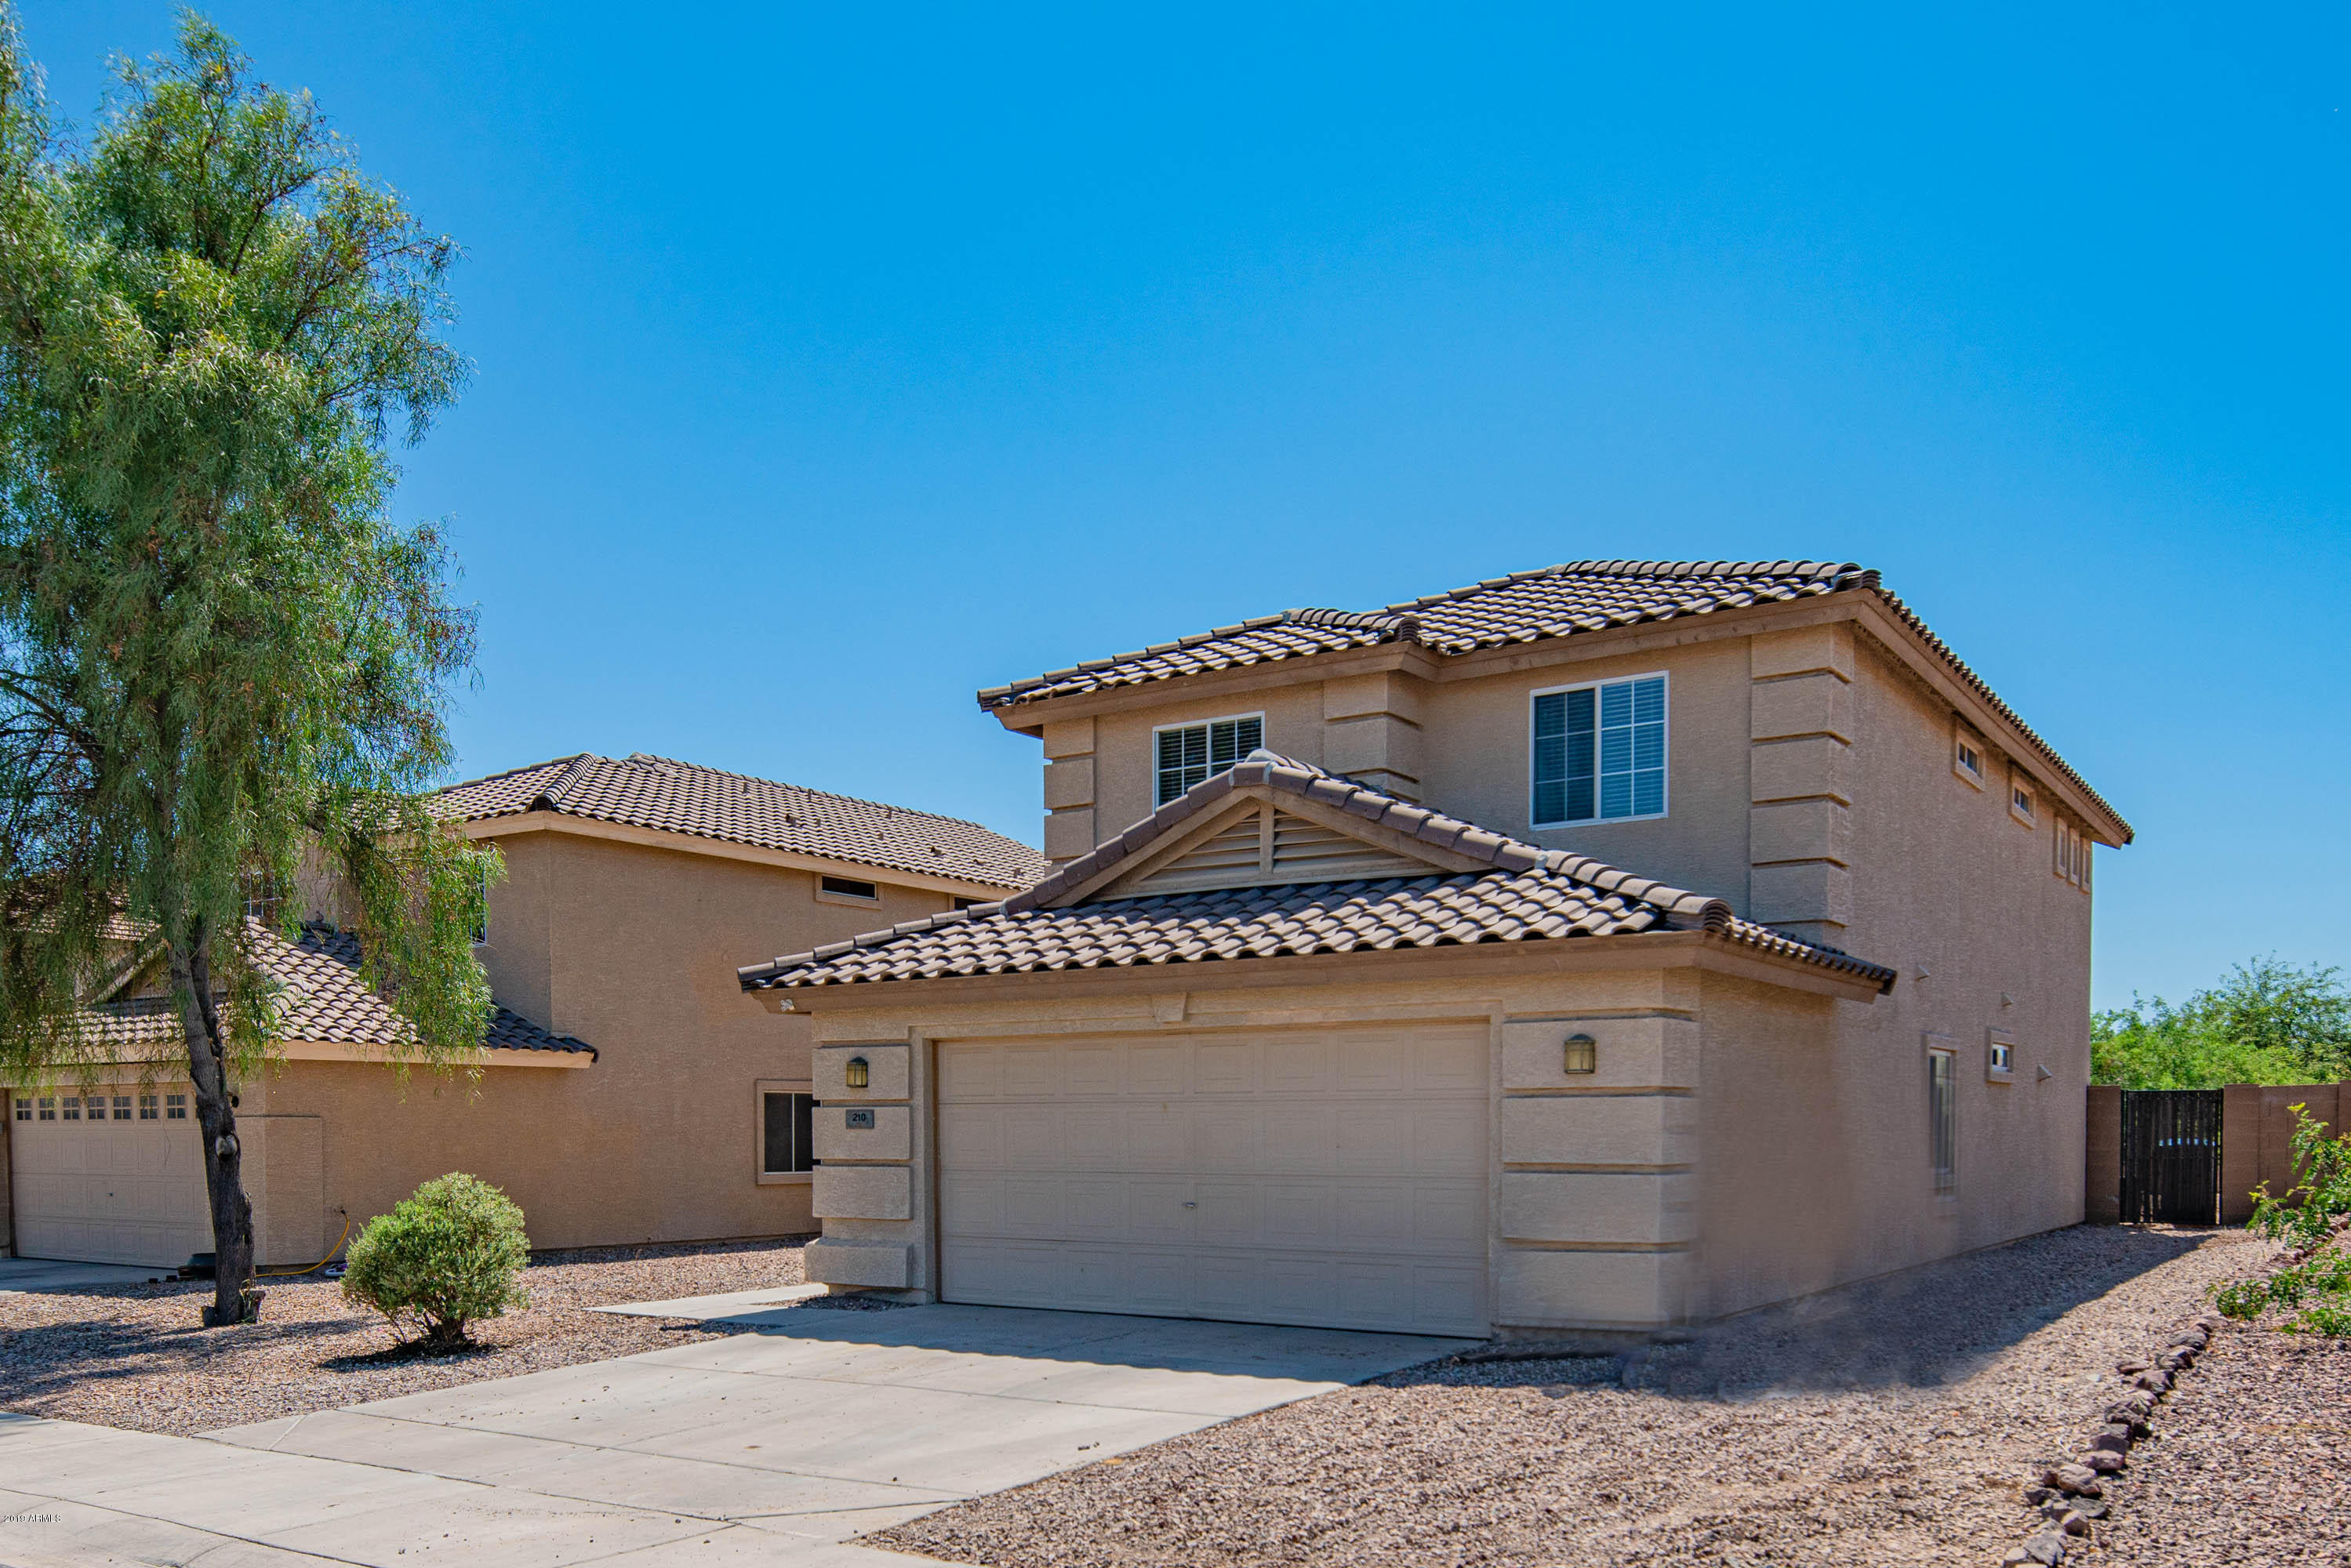 MLS 5971772 210 N 224TH Lane, Buckeye, AZ 85326 Buckeye AZ Sundance